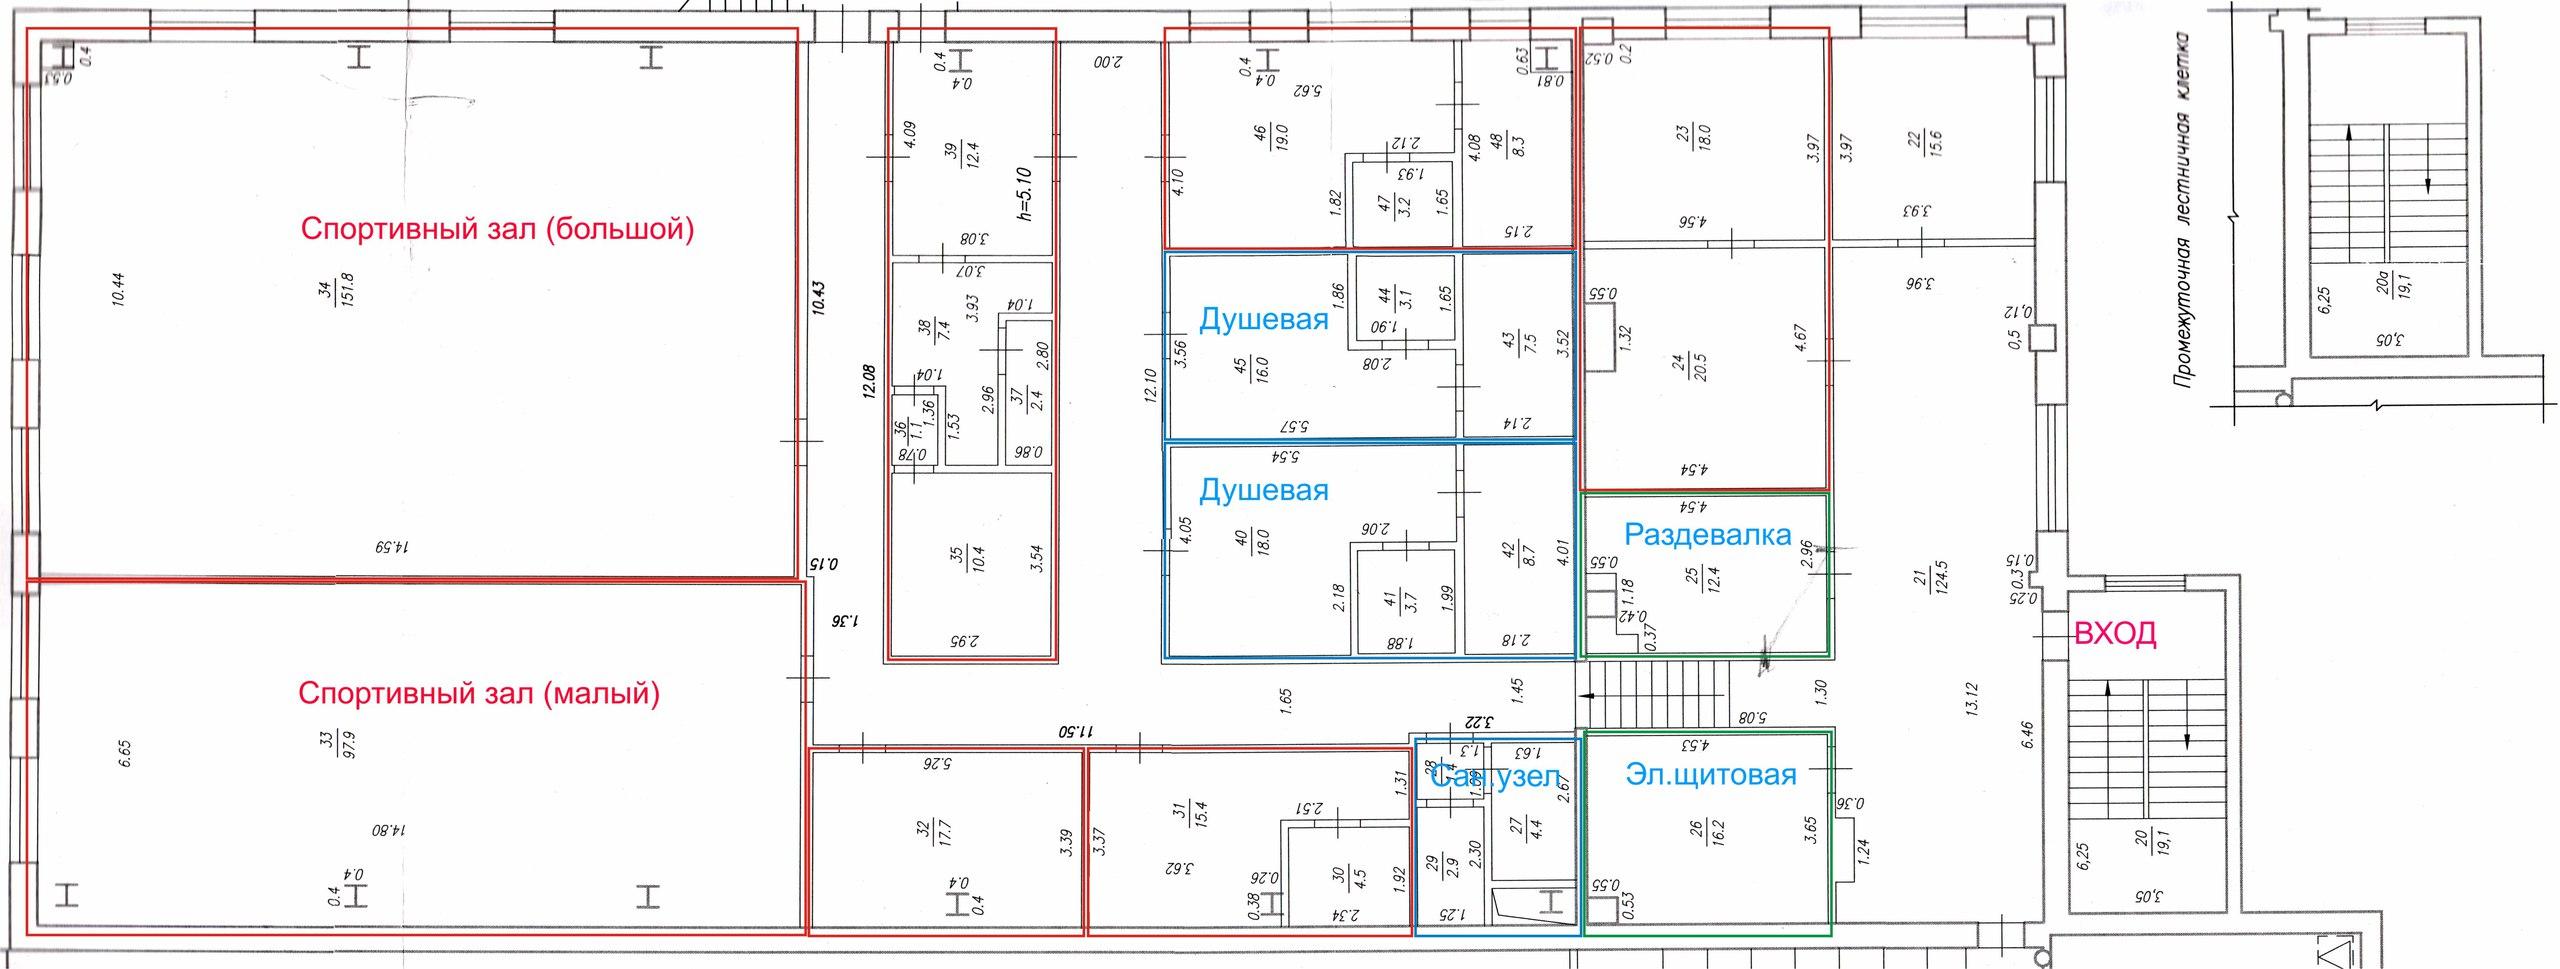 План помещений - Спортзалы 2 этаж